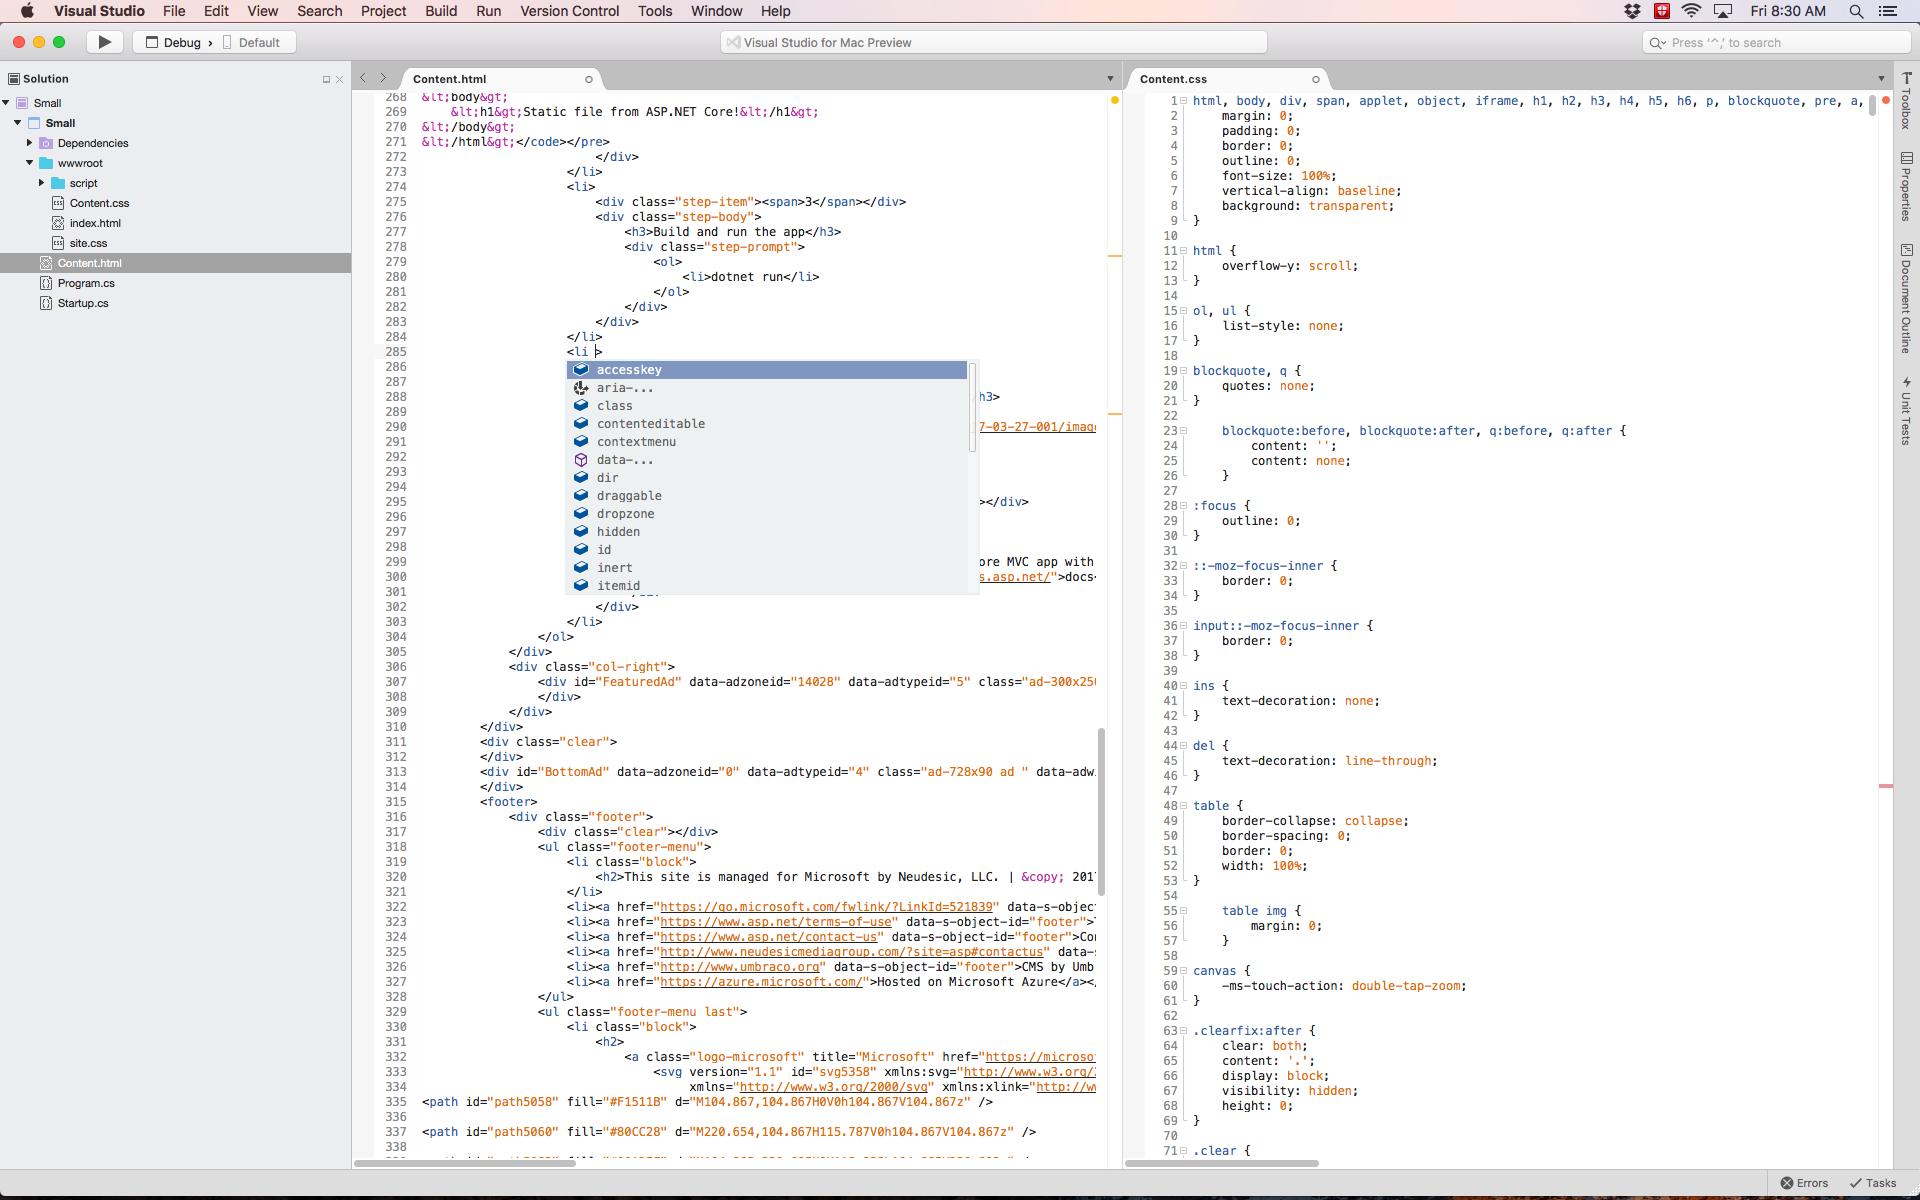 asp.net web application in visual studio 2017 for mac